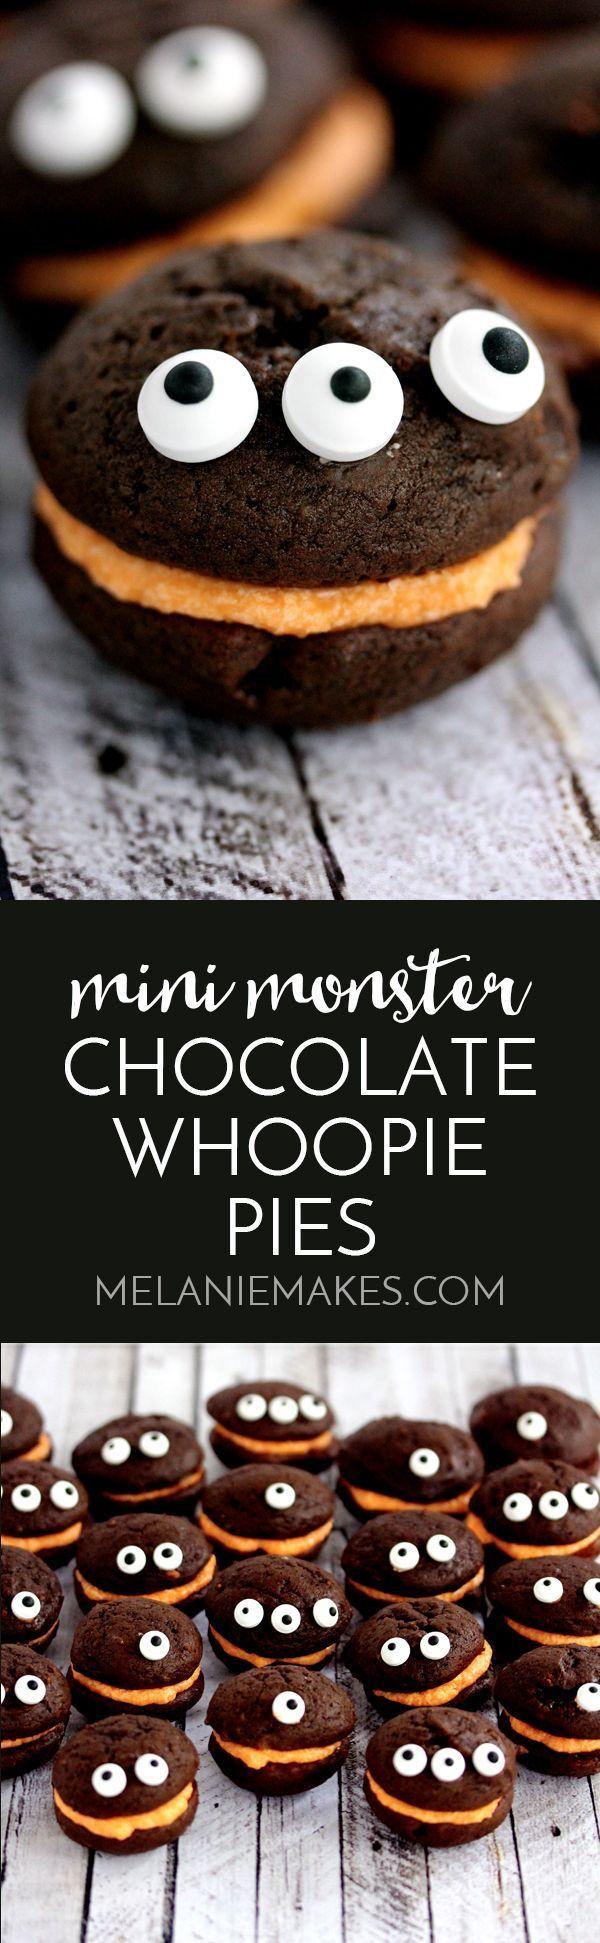 Best 25+ Nourriture halloween ideas on Pinterest | Nourriture pour ...